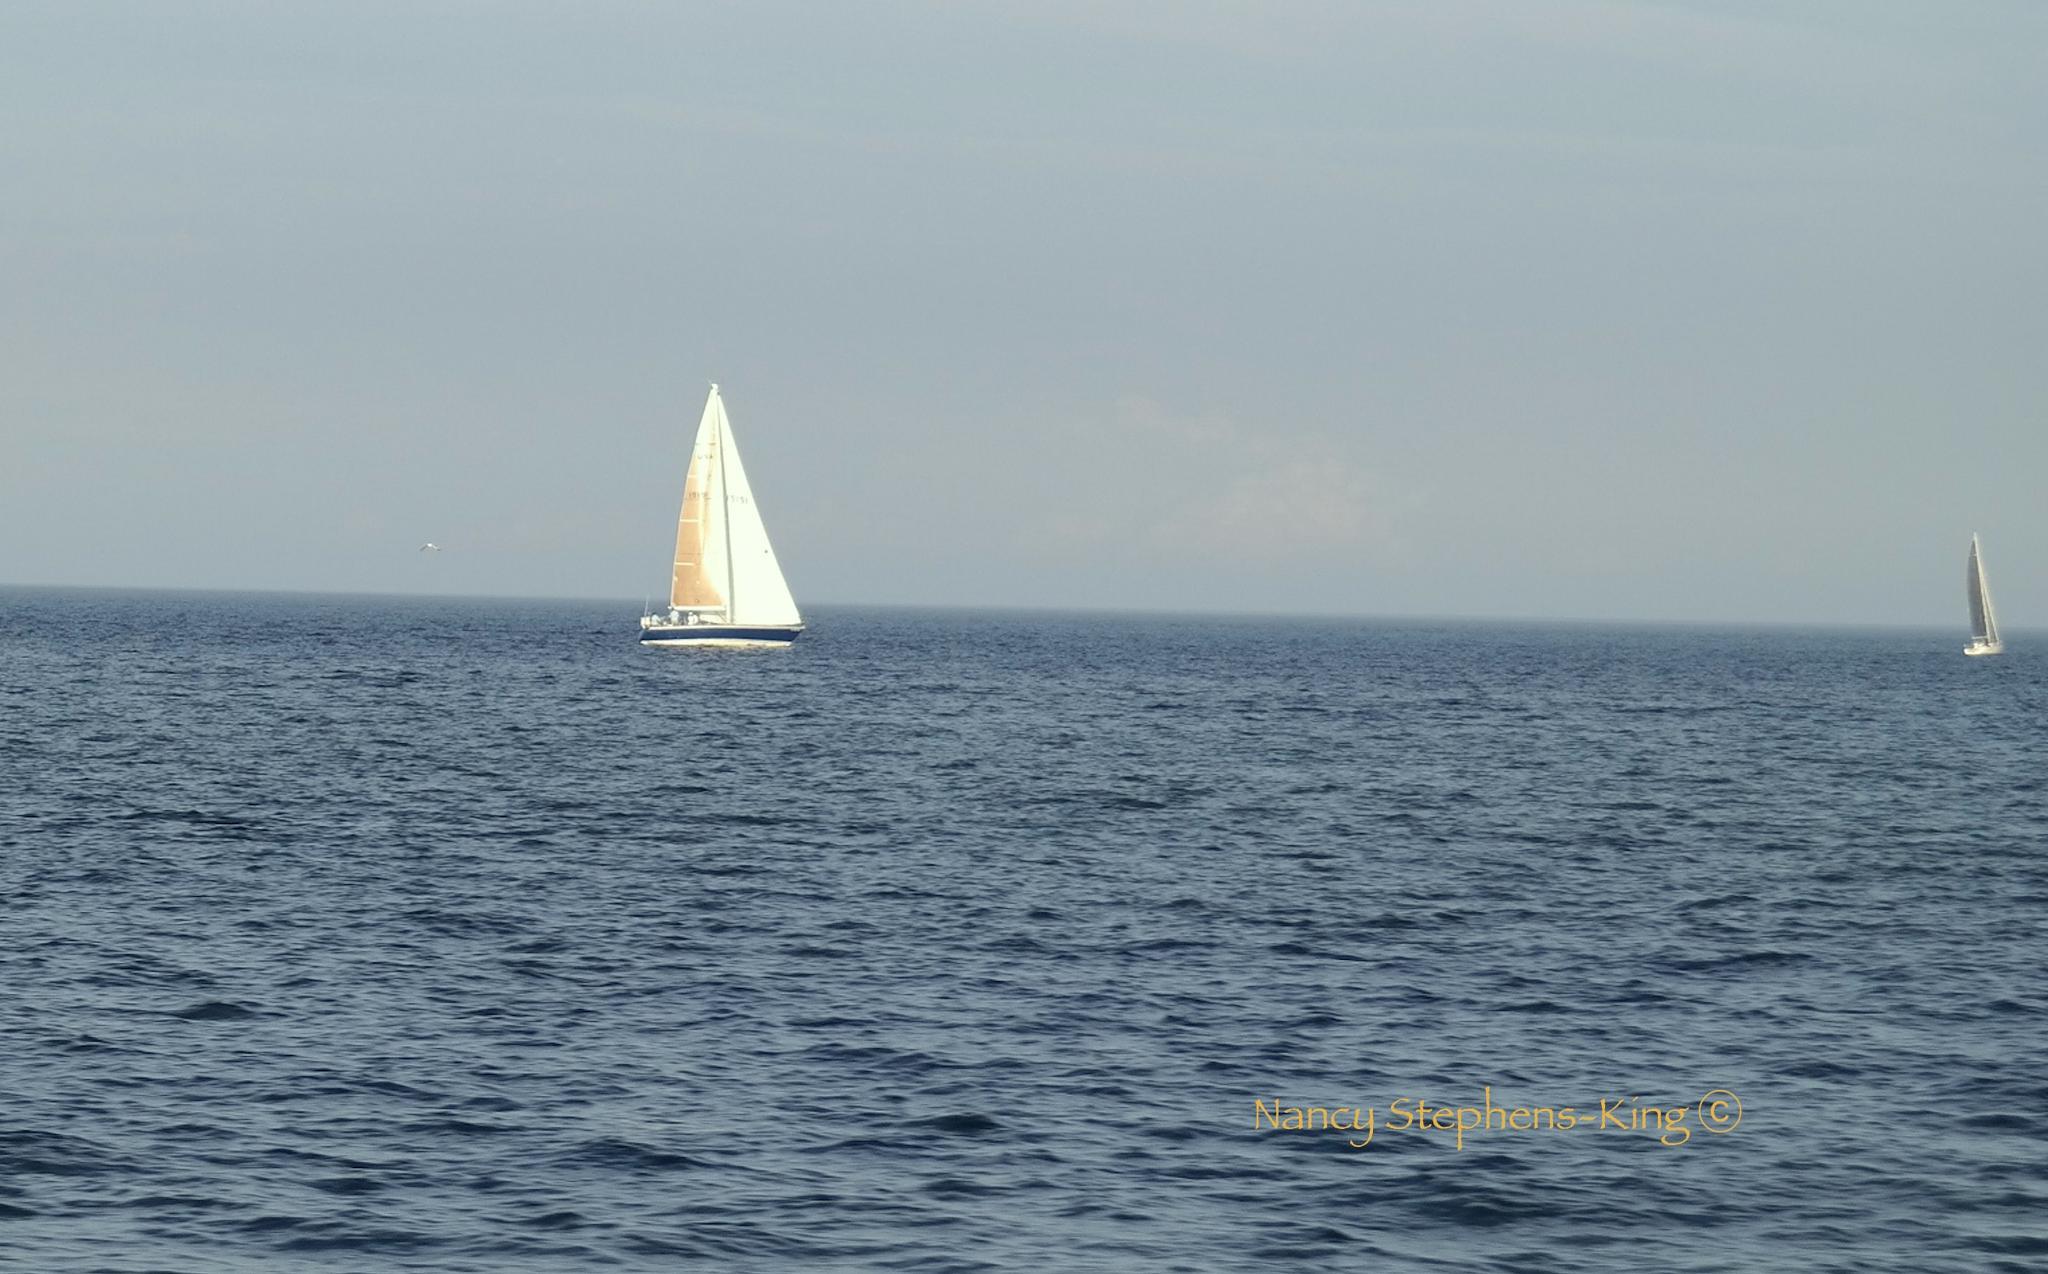 Sailing on Lake Sinclair by nstephensking